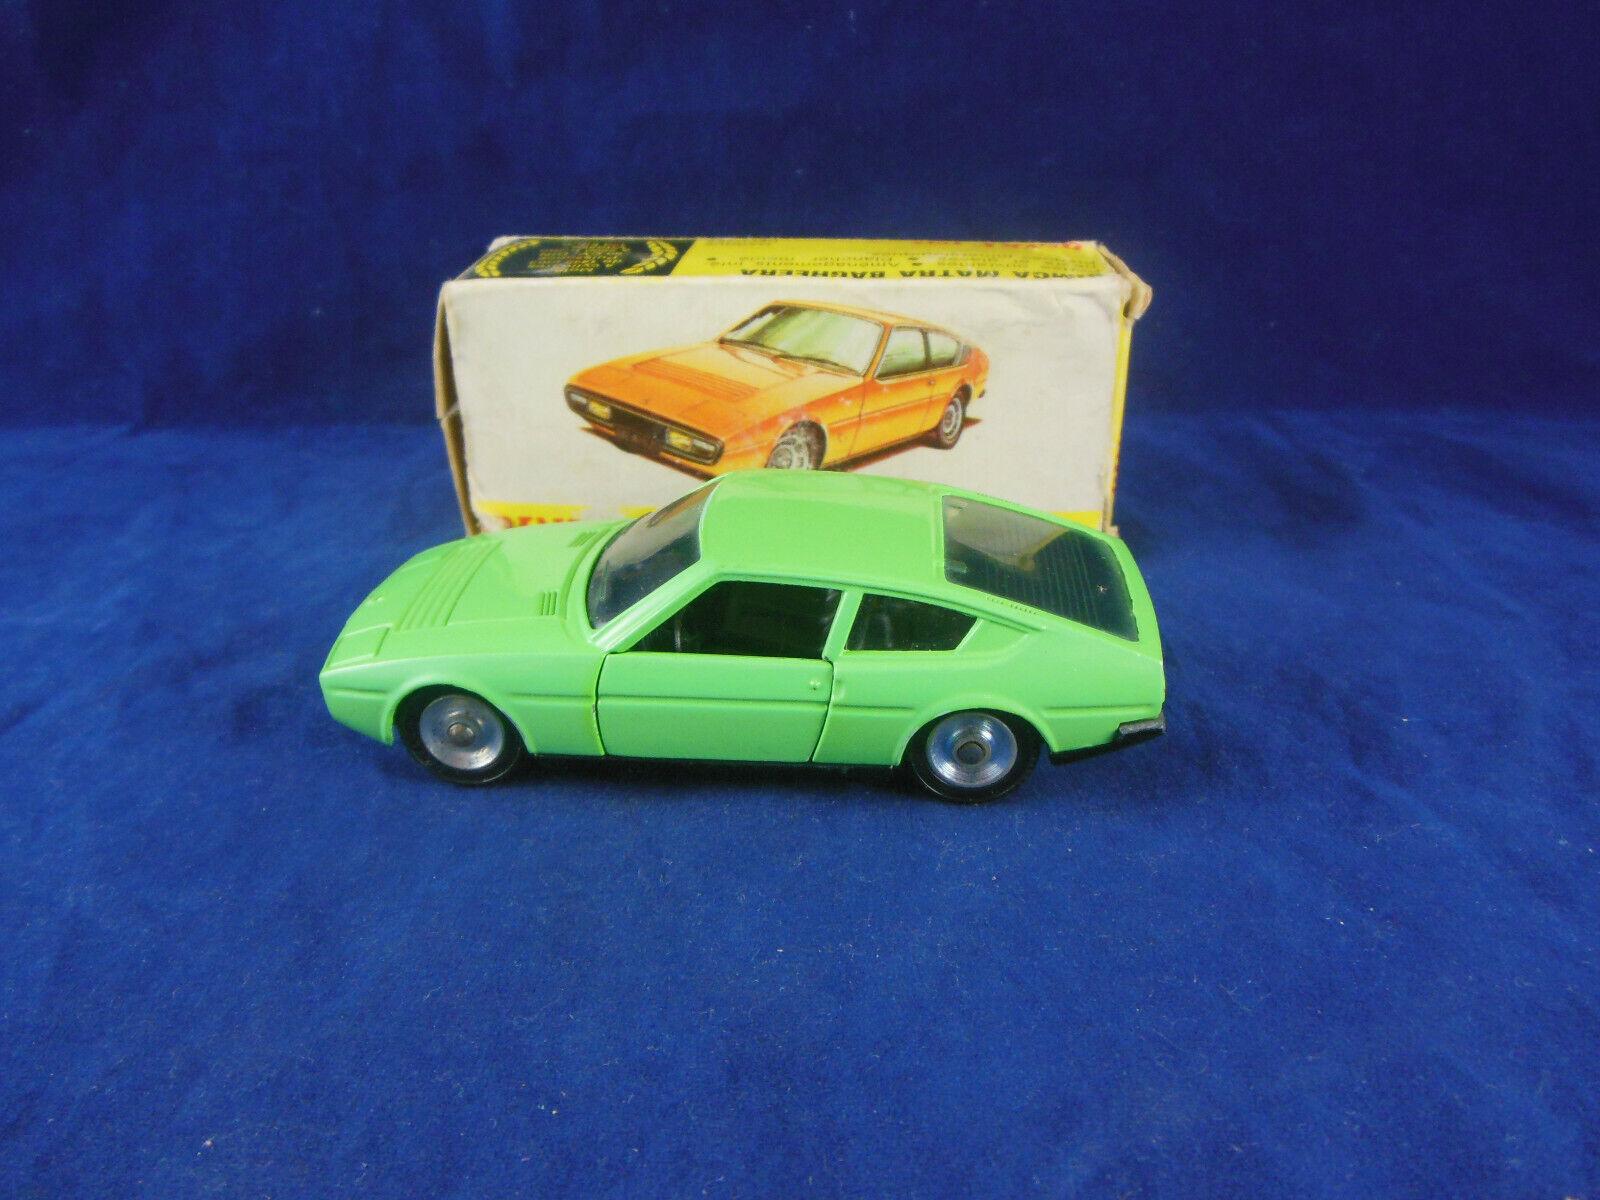 Dinky toys 011454 Simca Matra Bagheera in Light Grün Made in Spain 1 43 Scale